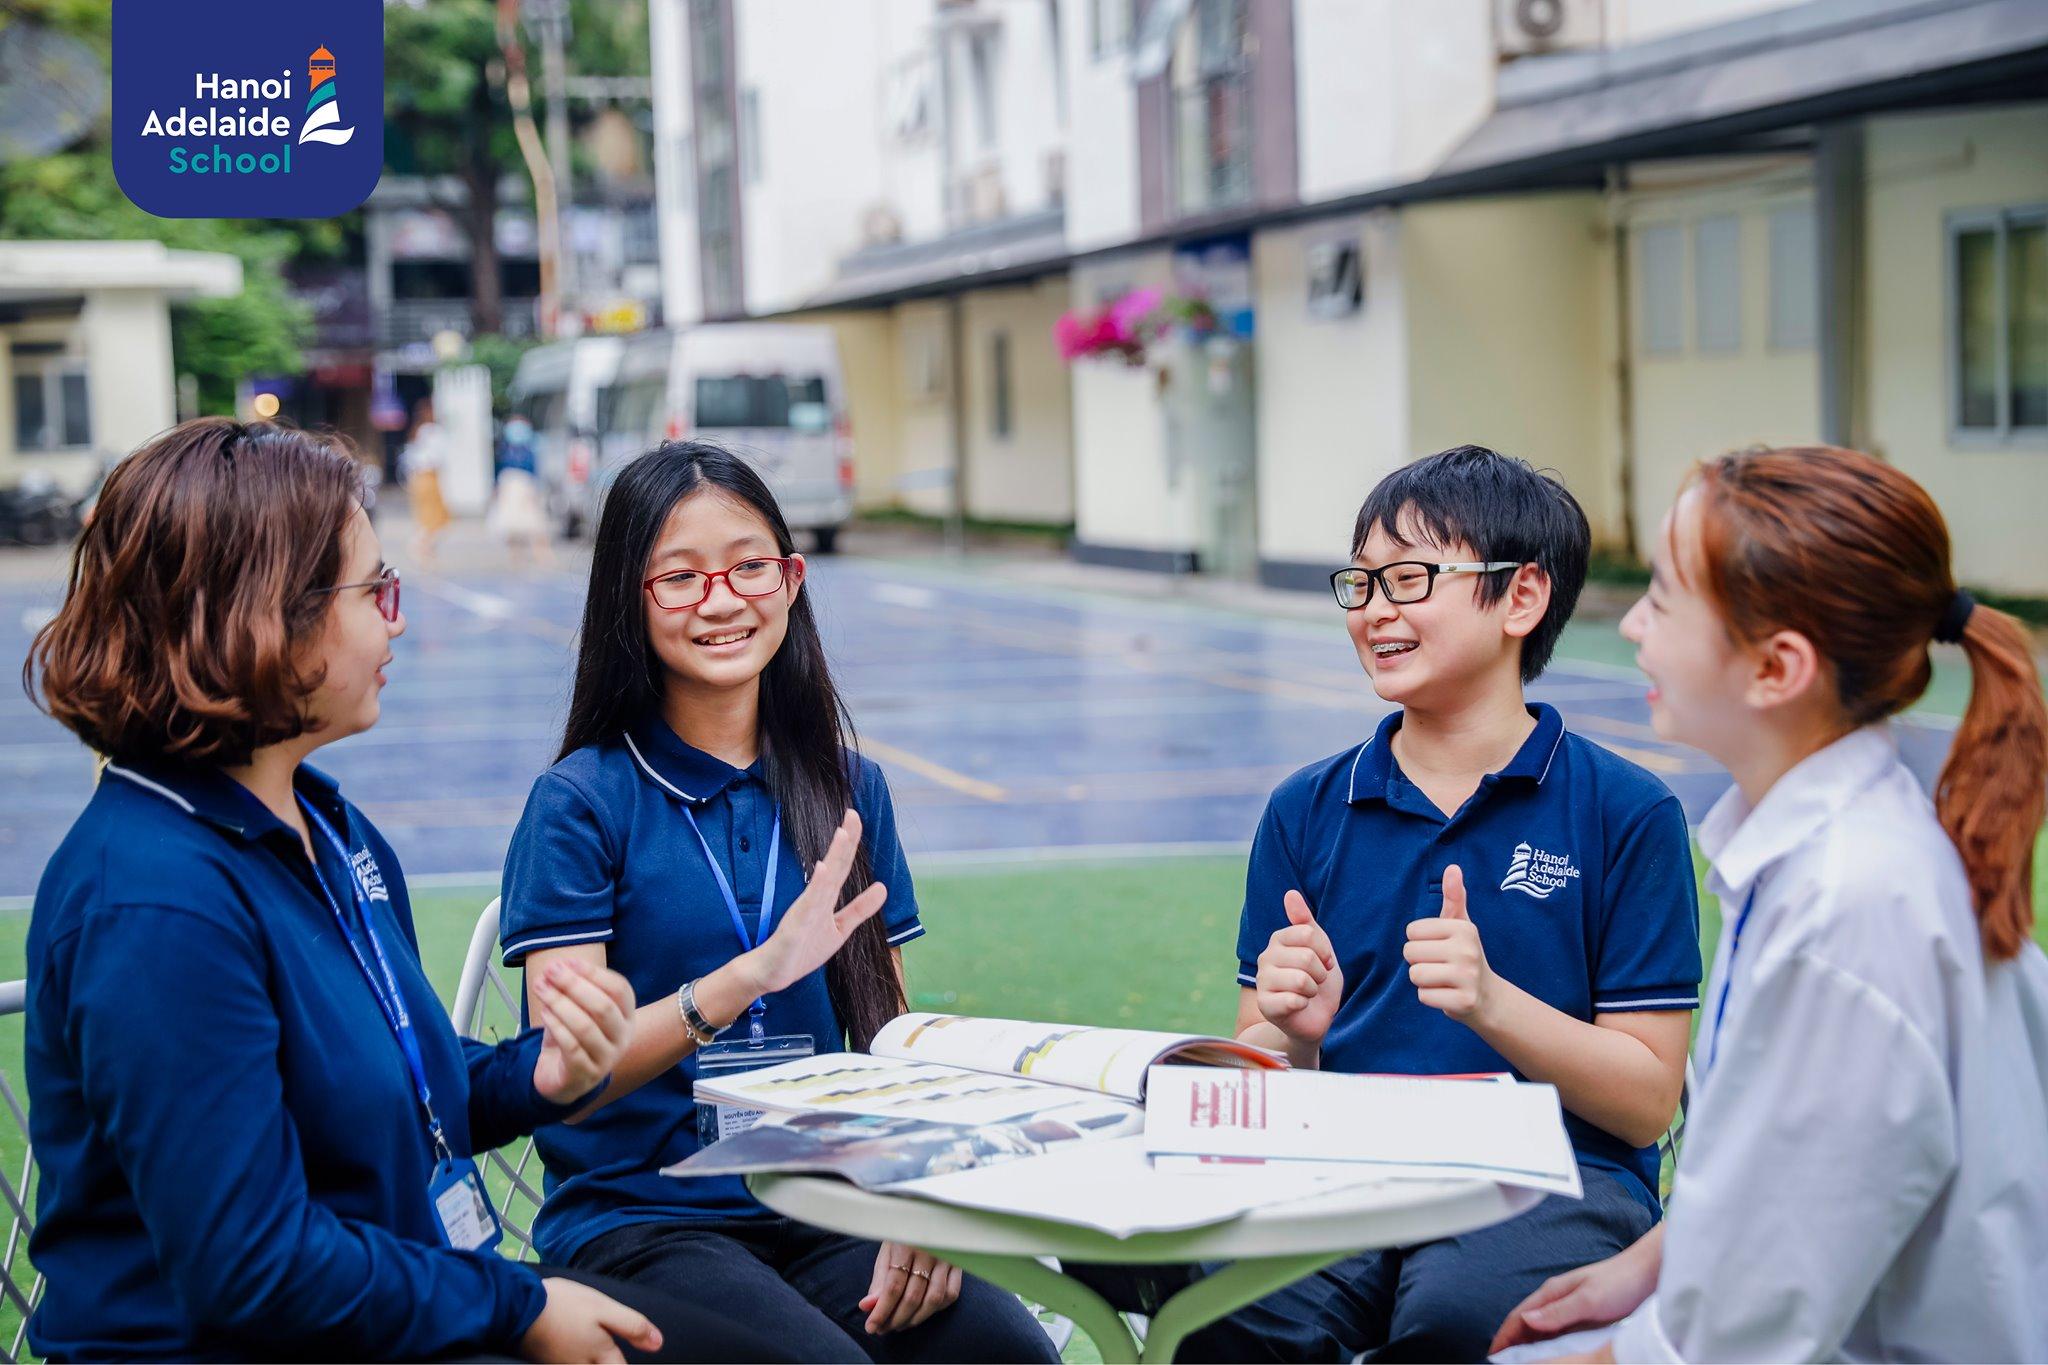 Học sinh Hanoi Adelaide School